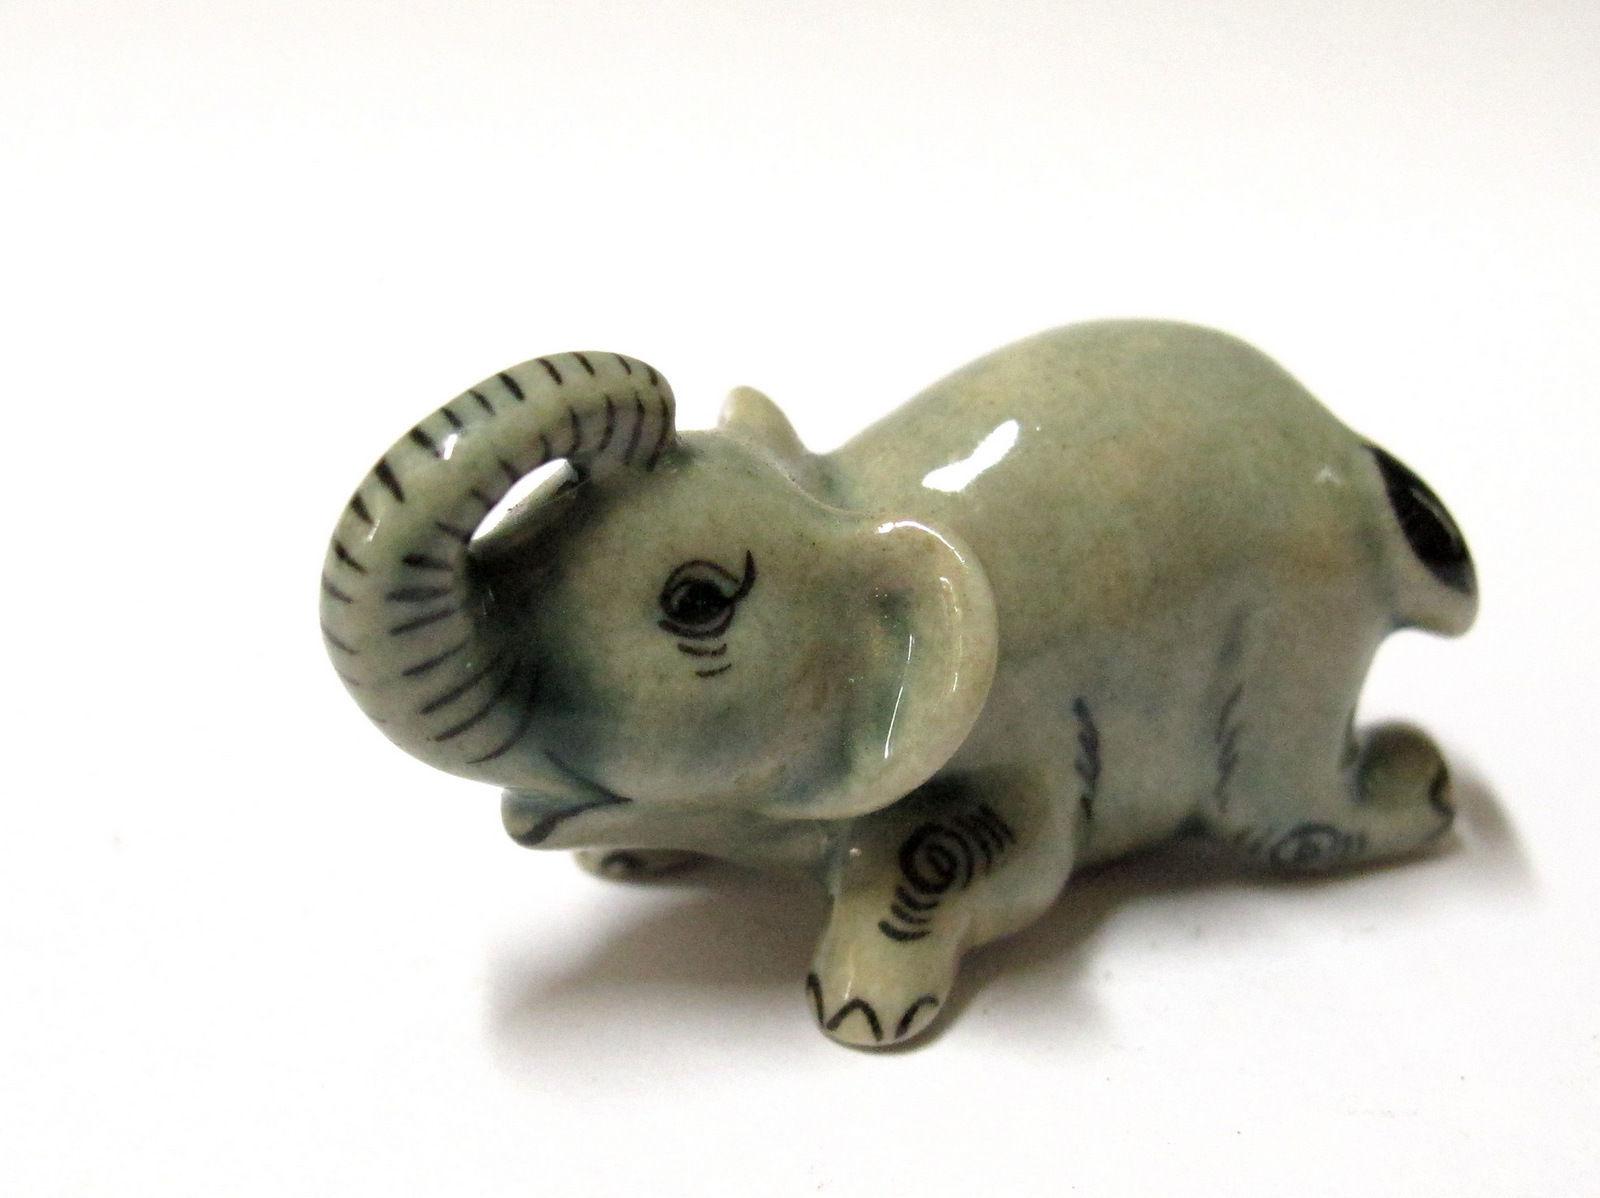 Doll House Miniature Collectible Porcelain Ceramic Circus